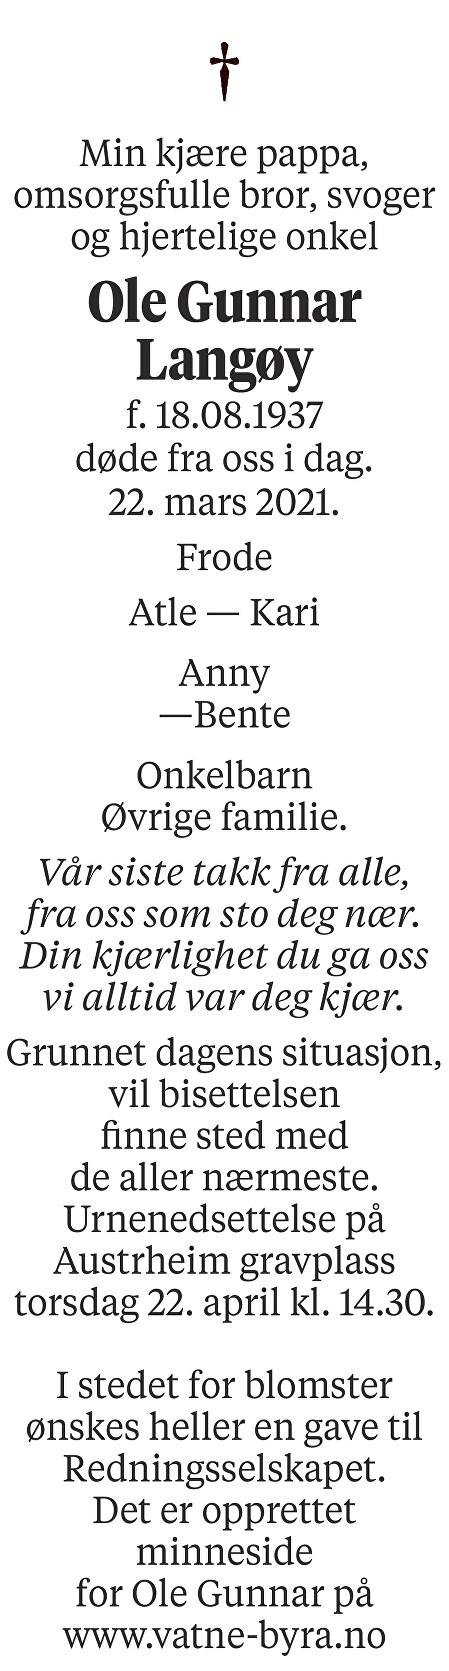 Ole Gunnar Langøy Dødsannonse